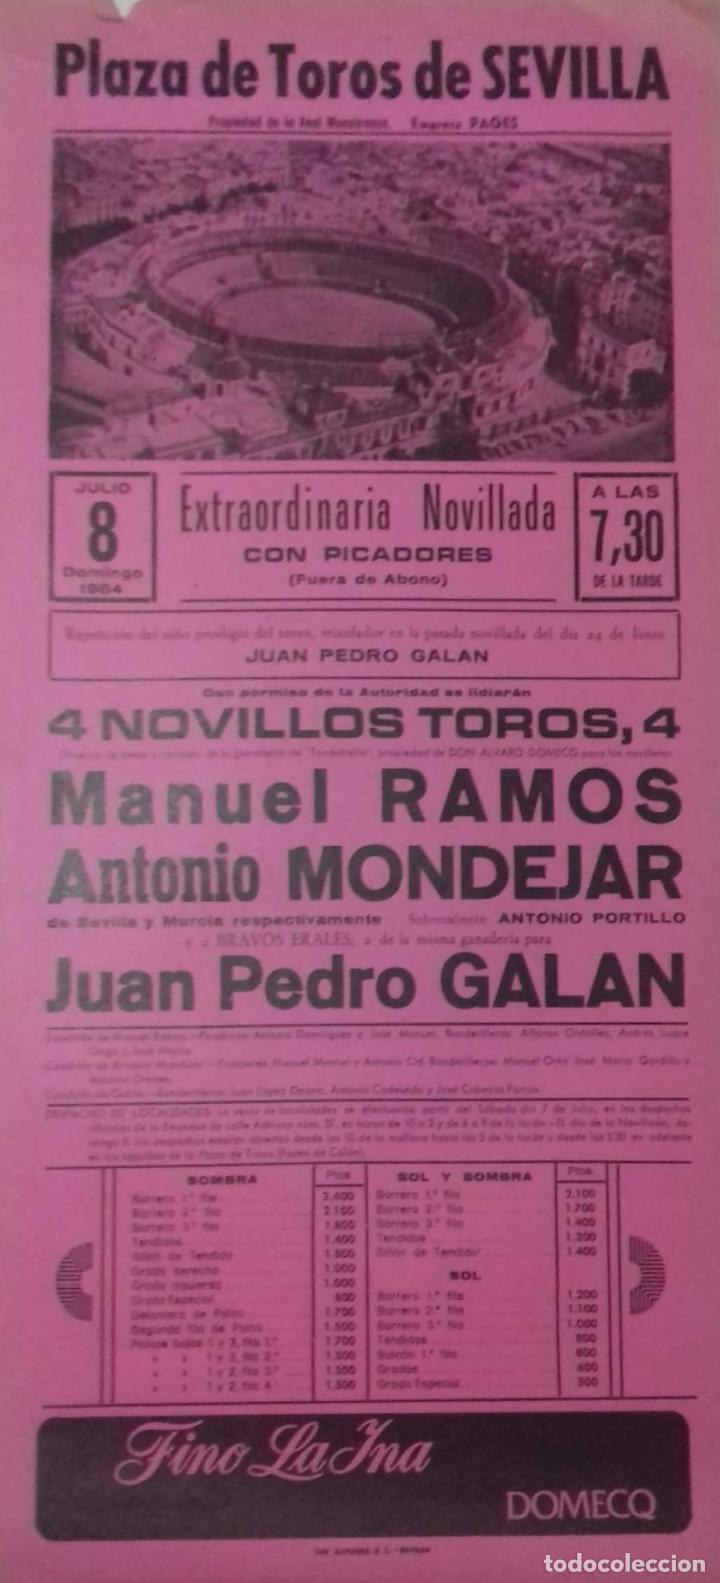 CARTEL. PLAZA TOROS DE SEVILLA.1984. LEER. (Coleccionismo - Carteles Gran Formato - Carteles Toros)